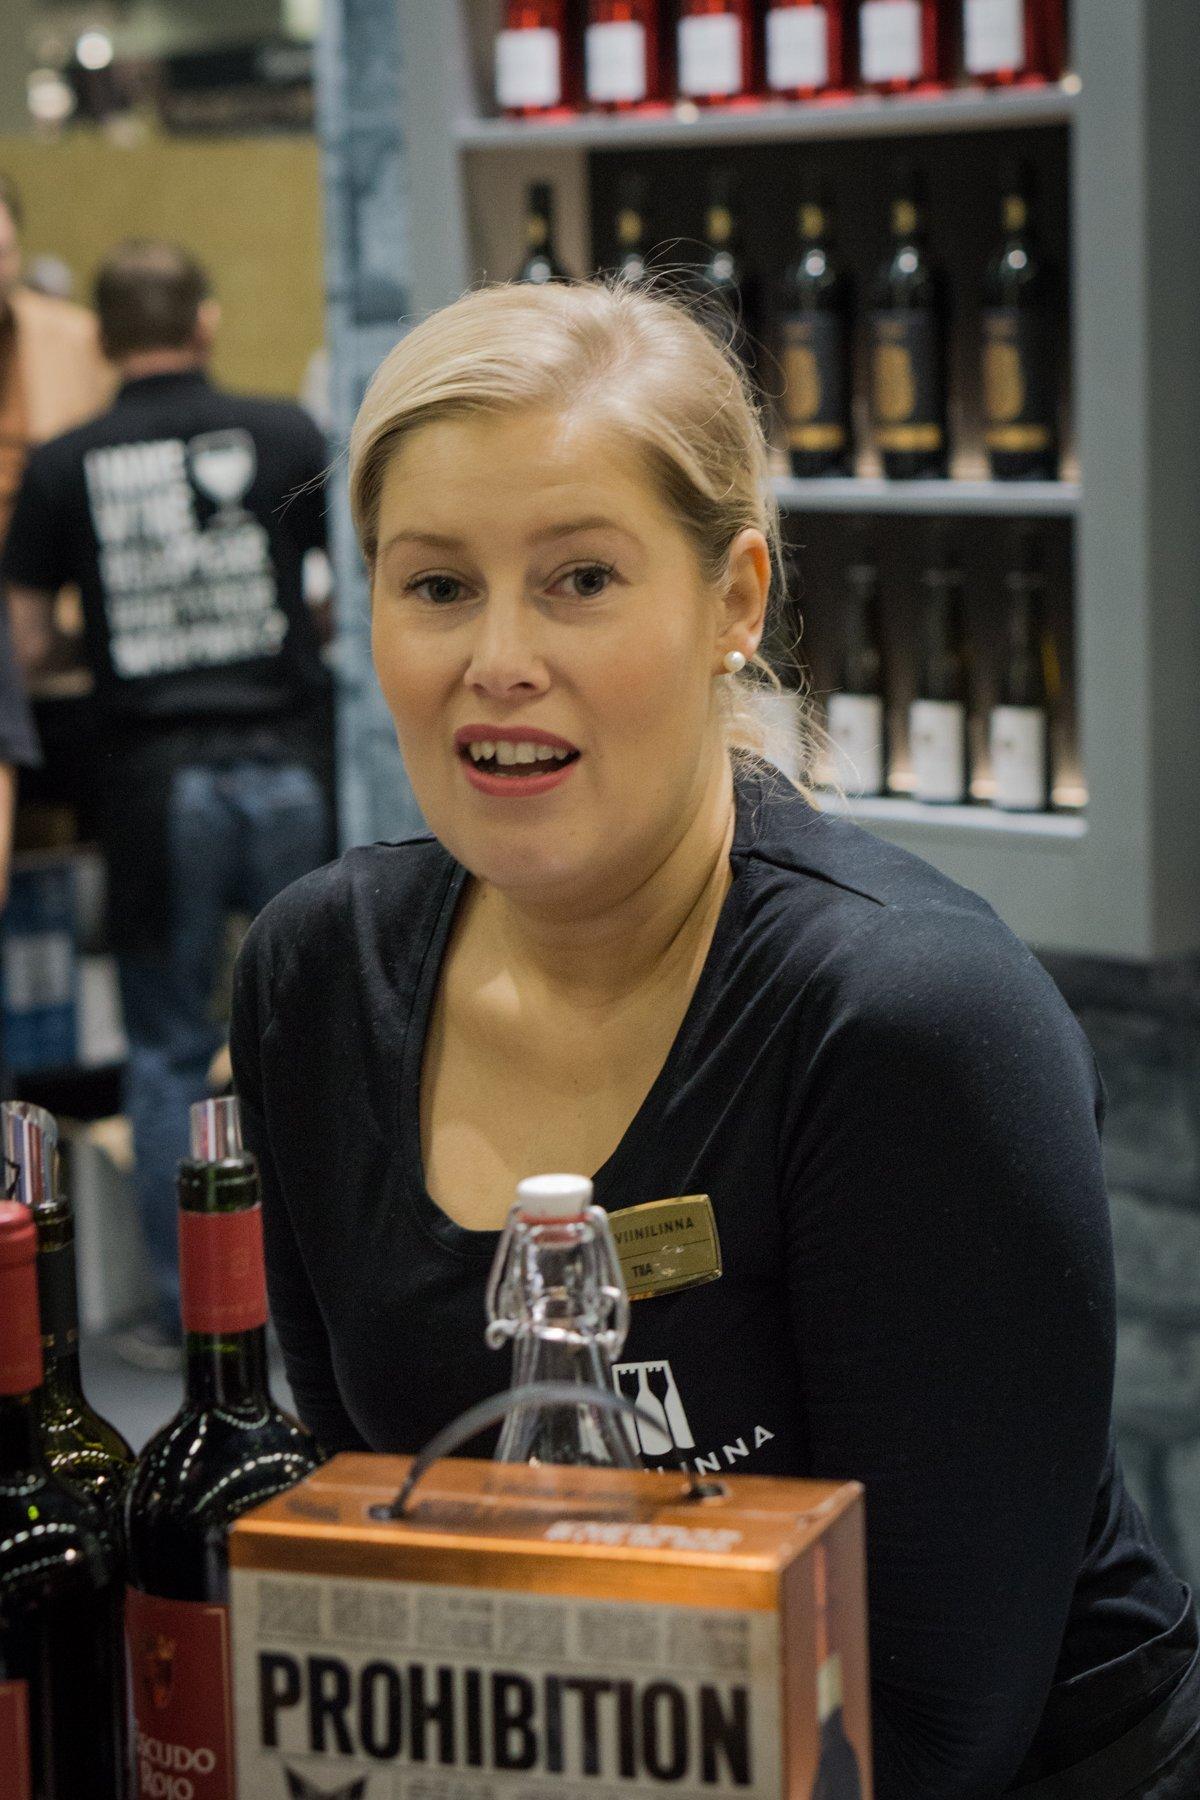 viini ja ruoka